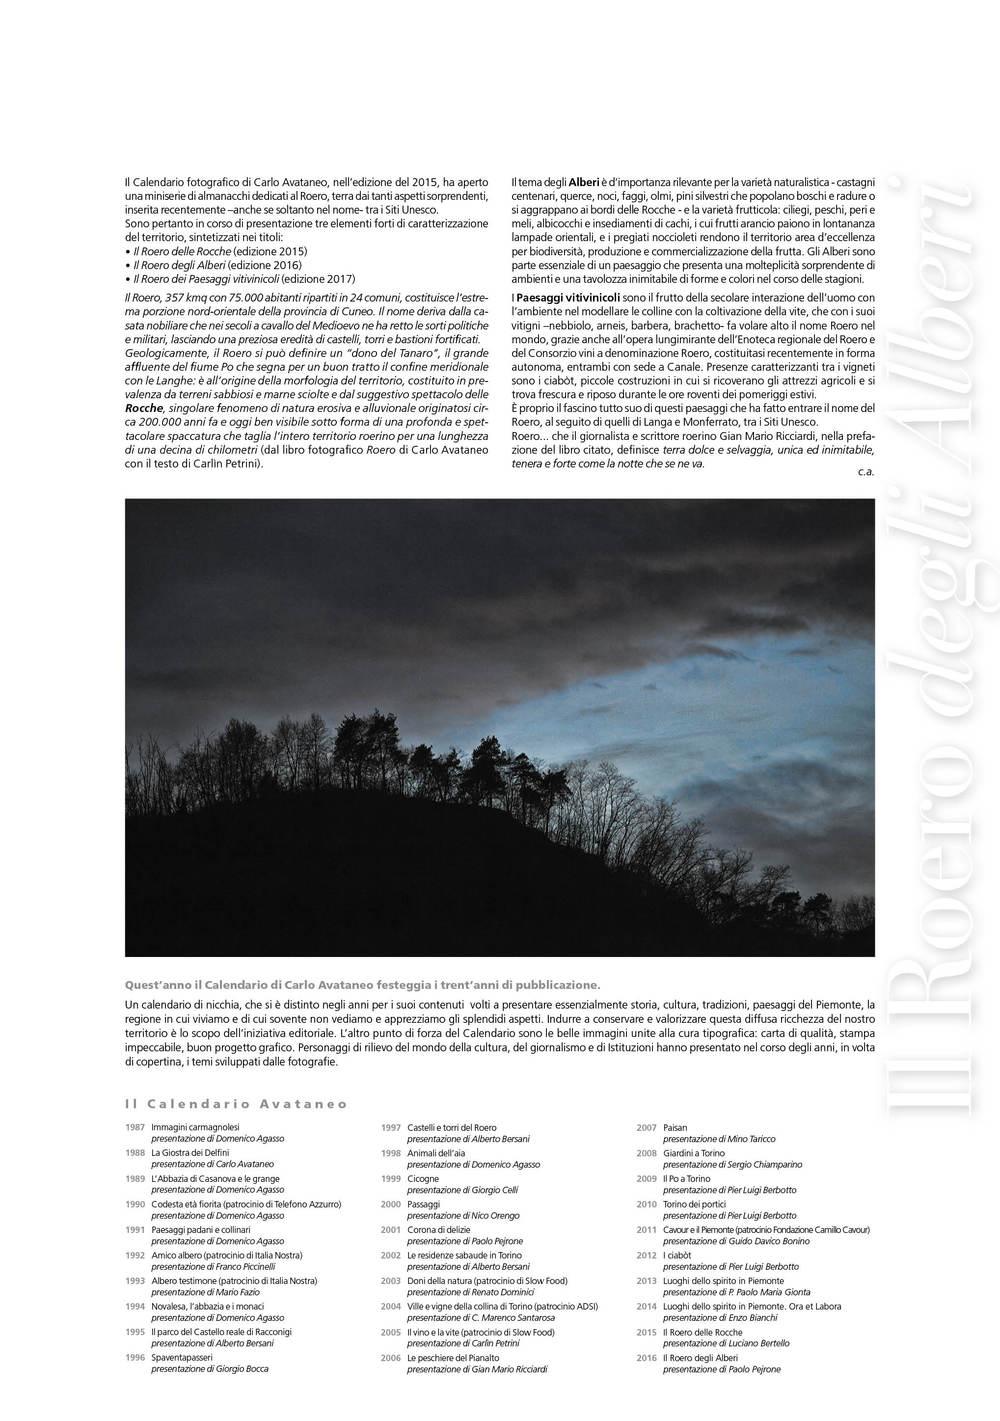 alberi del roero_cop 2016_b23.jpg